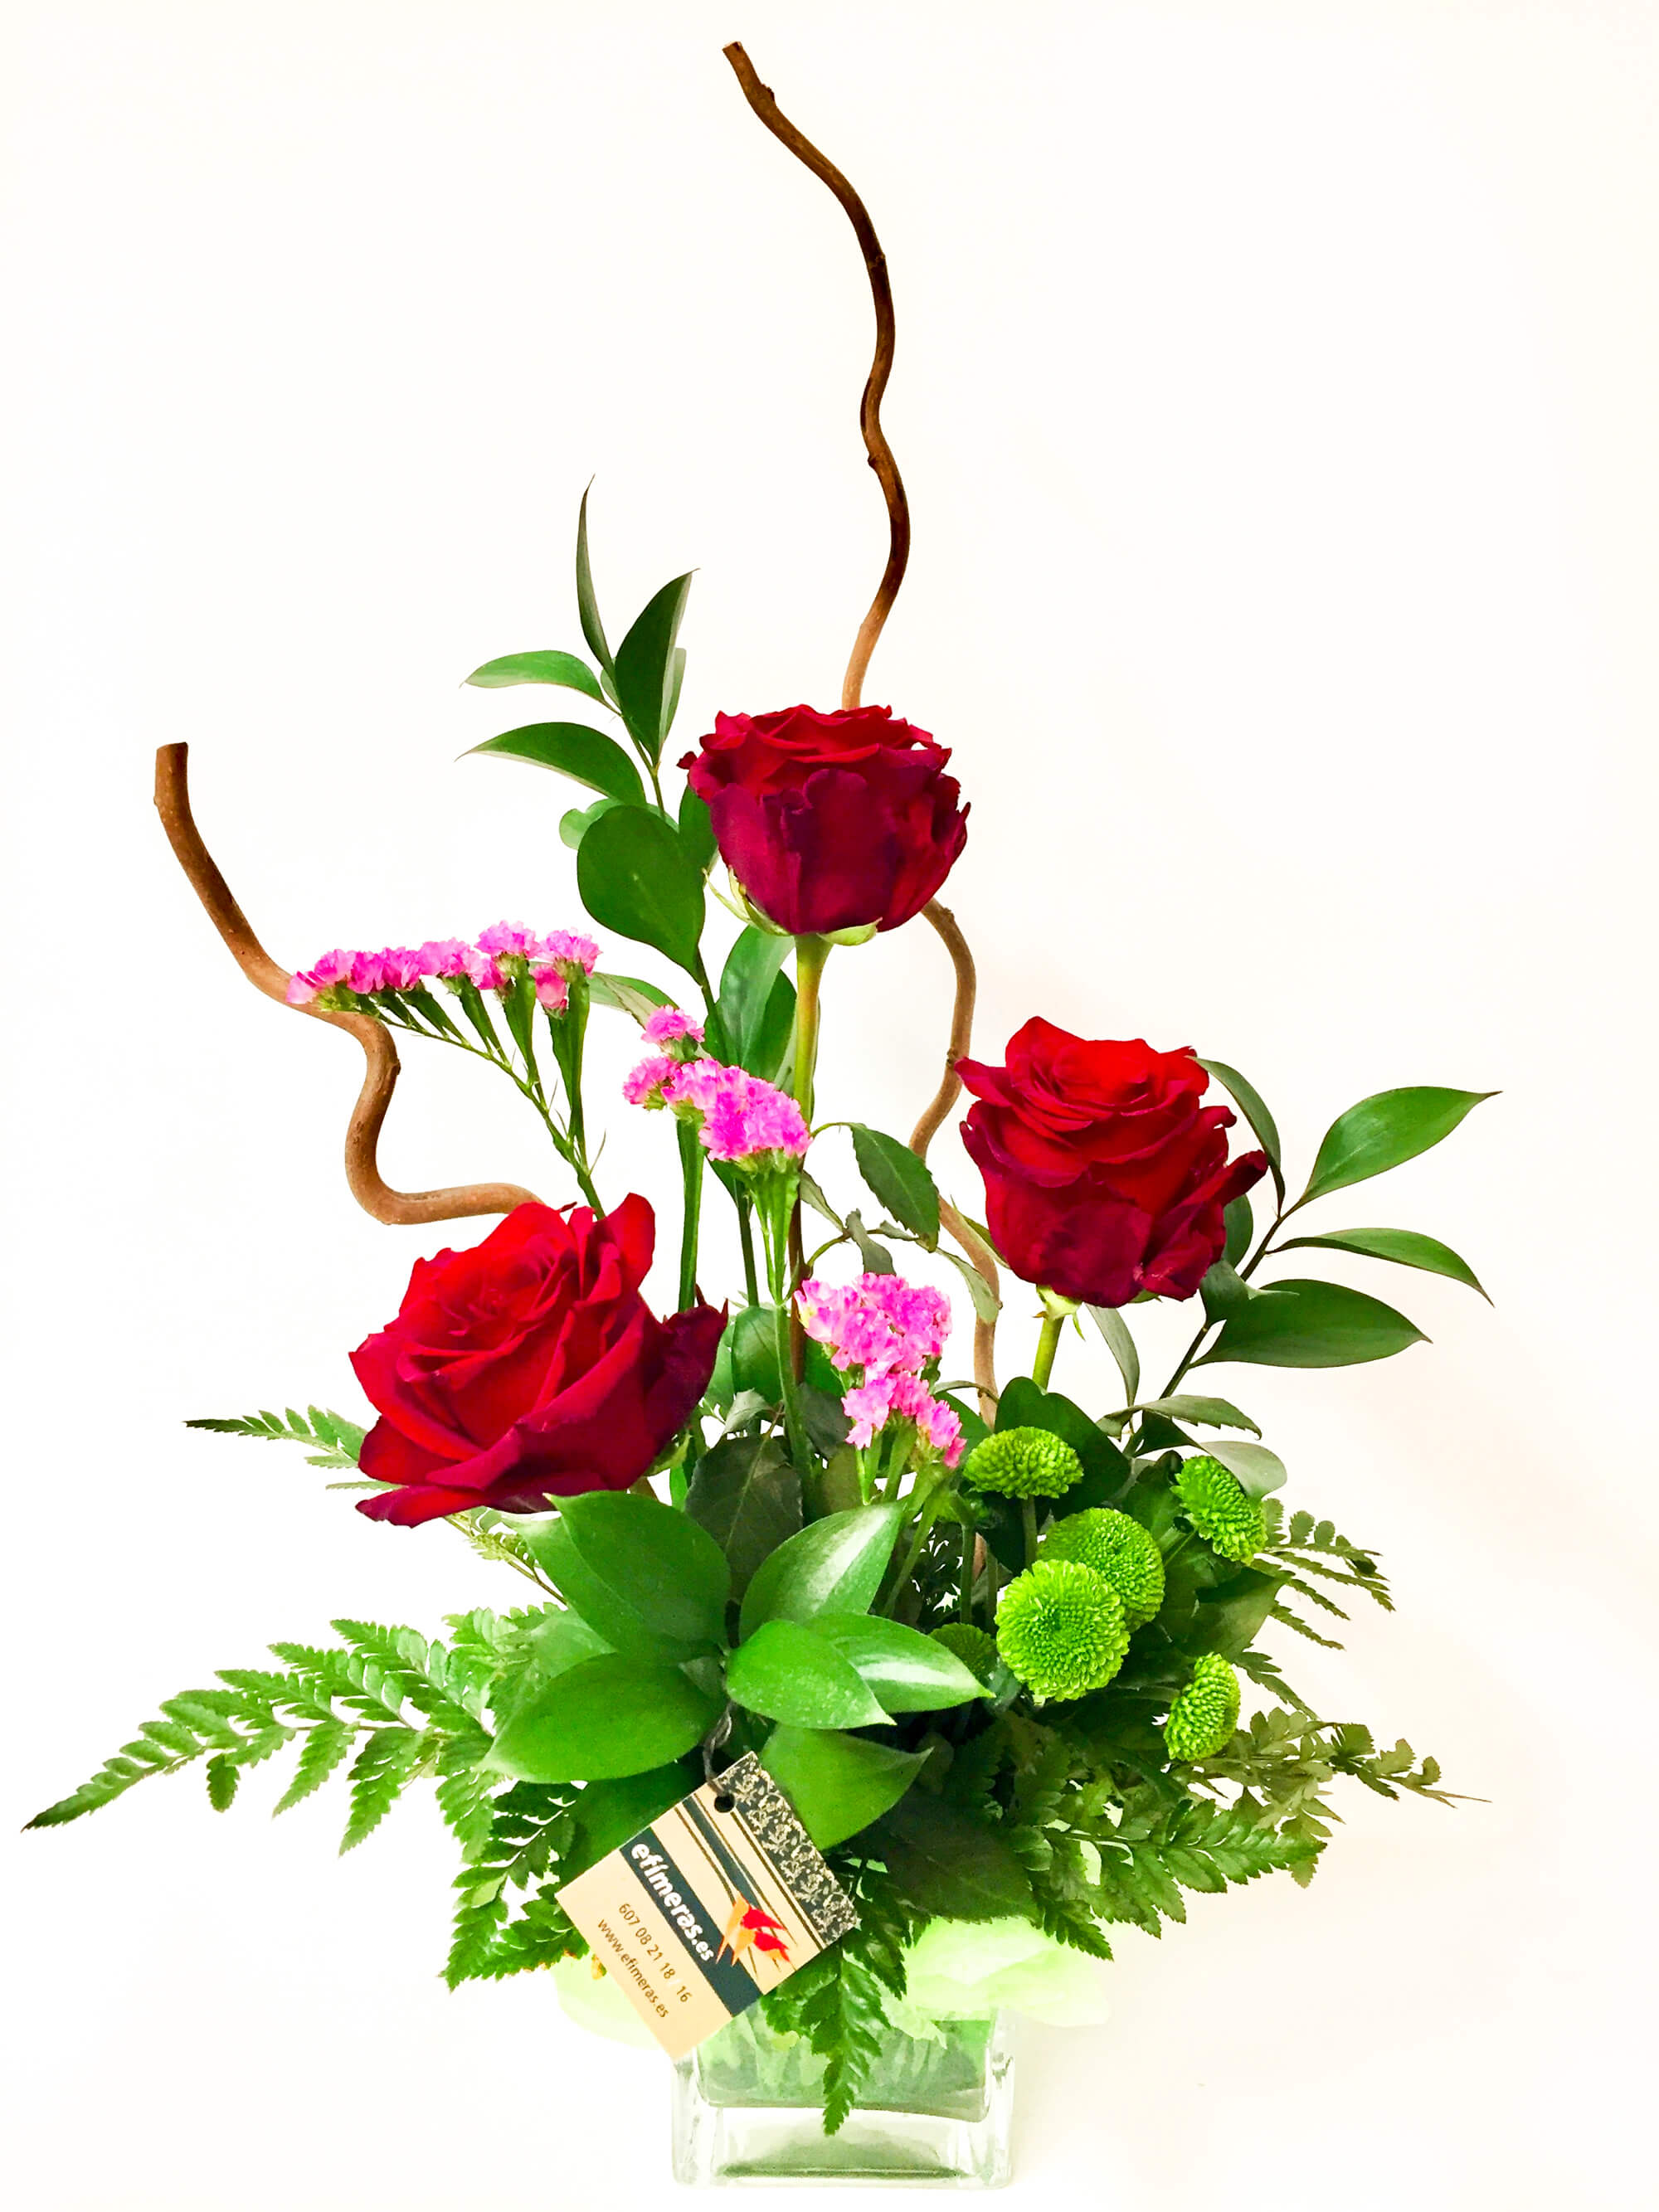 Detalle floral de tres rosas, enviar tres rosas a domicilio, detalles de san valentin